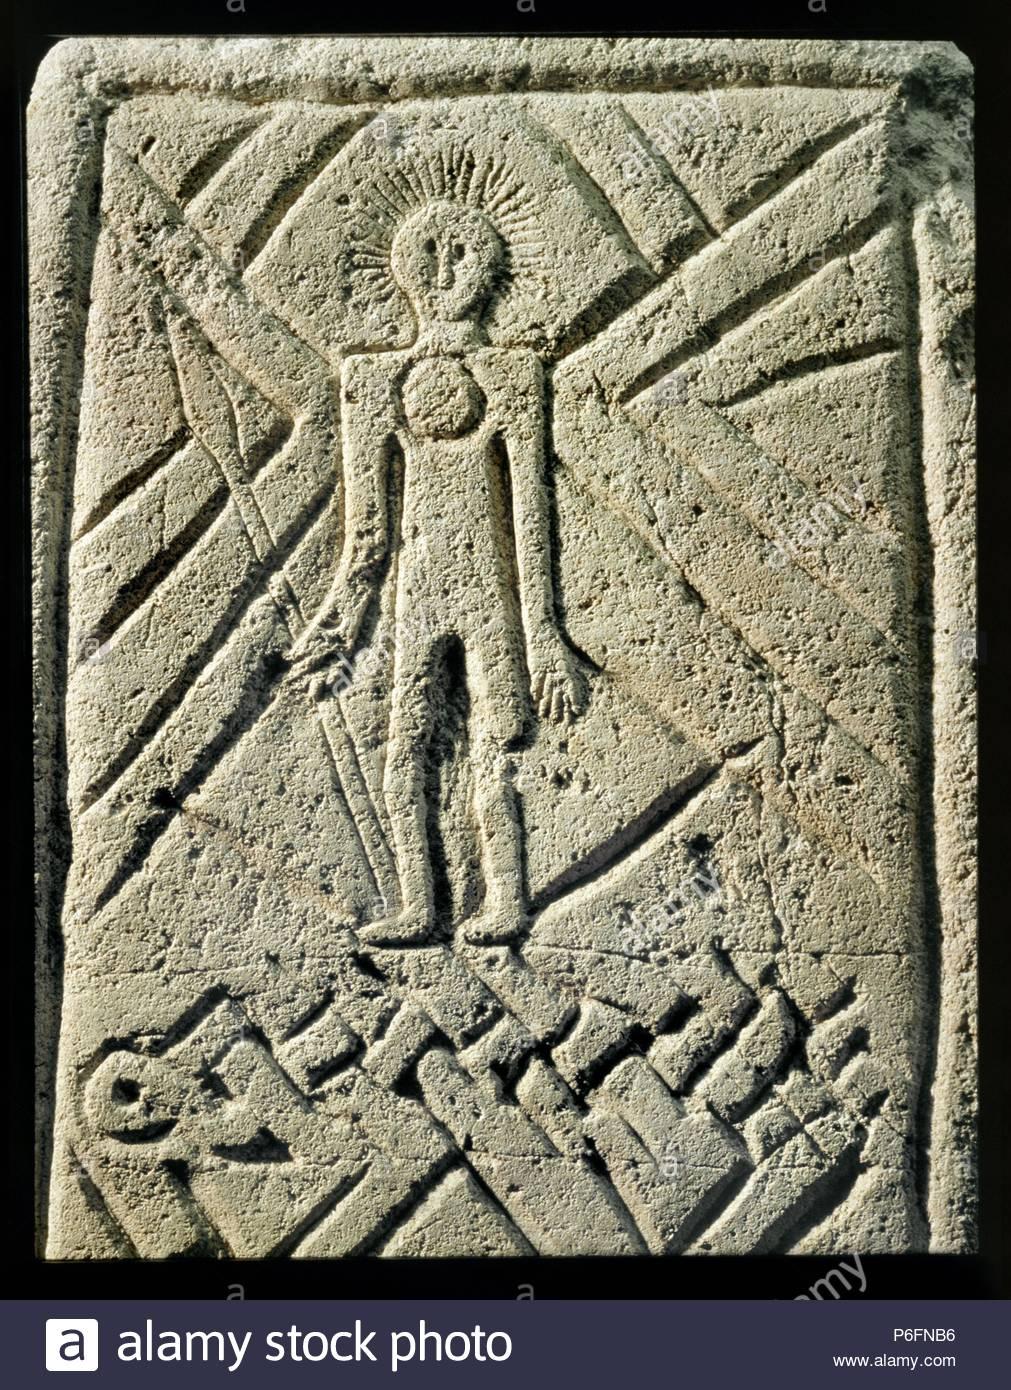 Frankish stone funerary monument 7th century showing stylised figure of Jesus Christ. Museum: Rheinishches Landesmuseum. - Stock Image